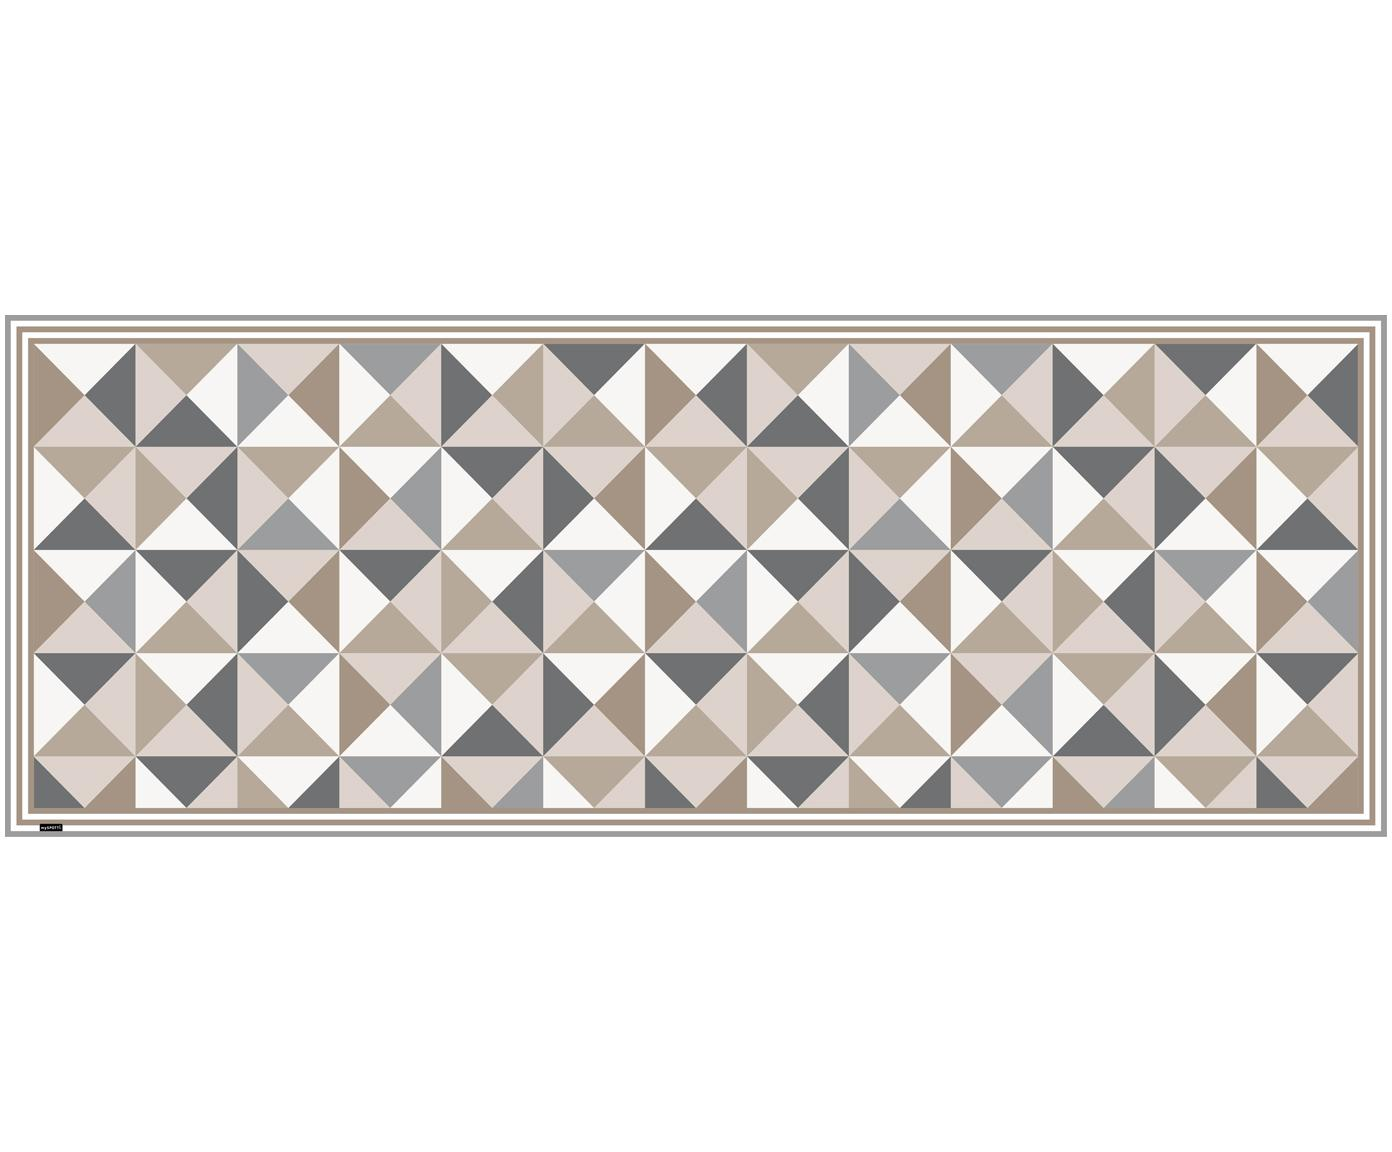 Tappetino in vinile Haakon, Vinile riciclabile, Grigio, beige, bianco, Larg. 68 x Lung. 180 cm